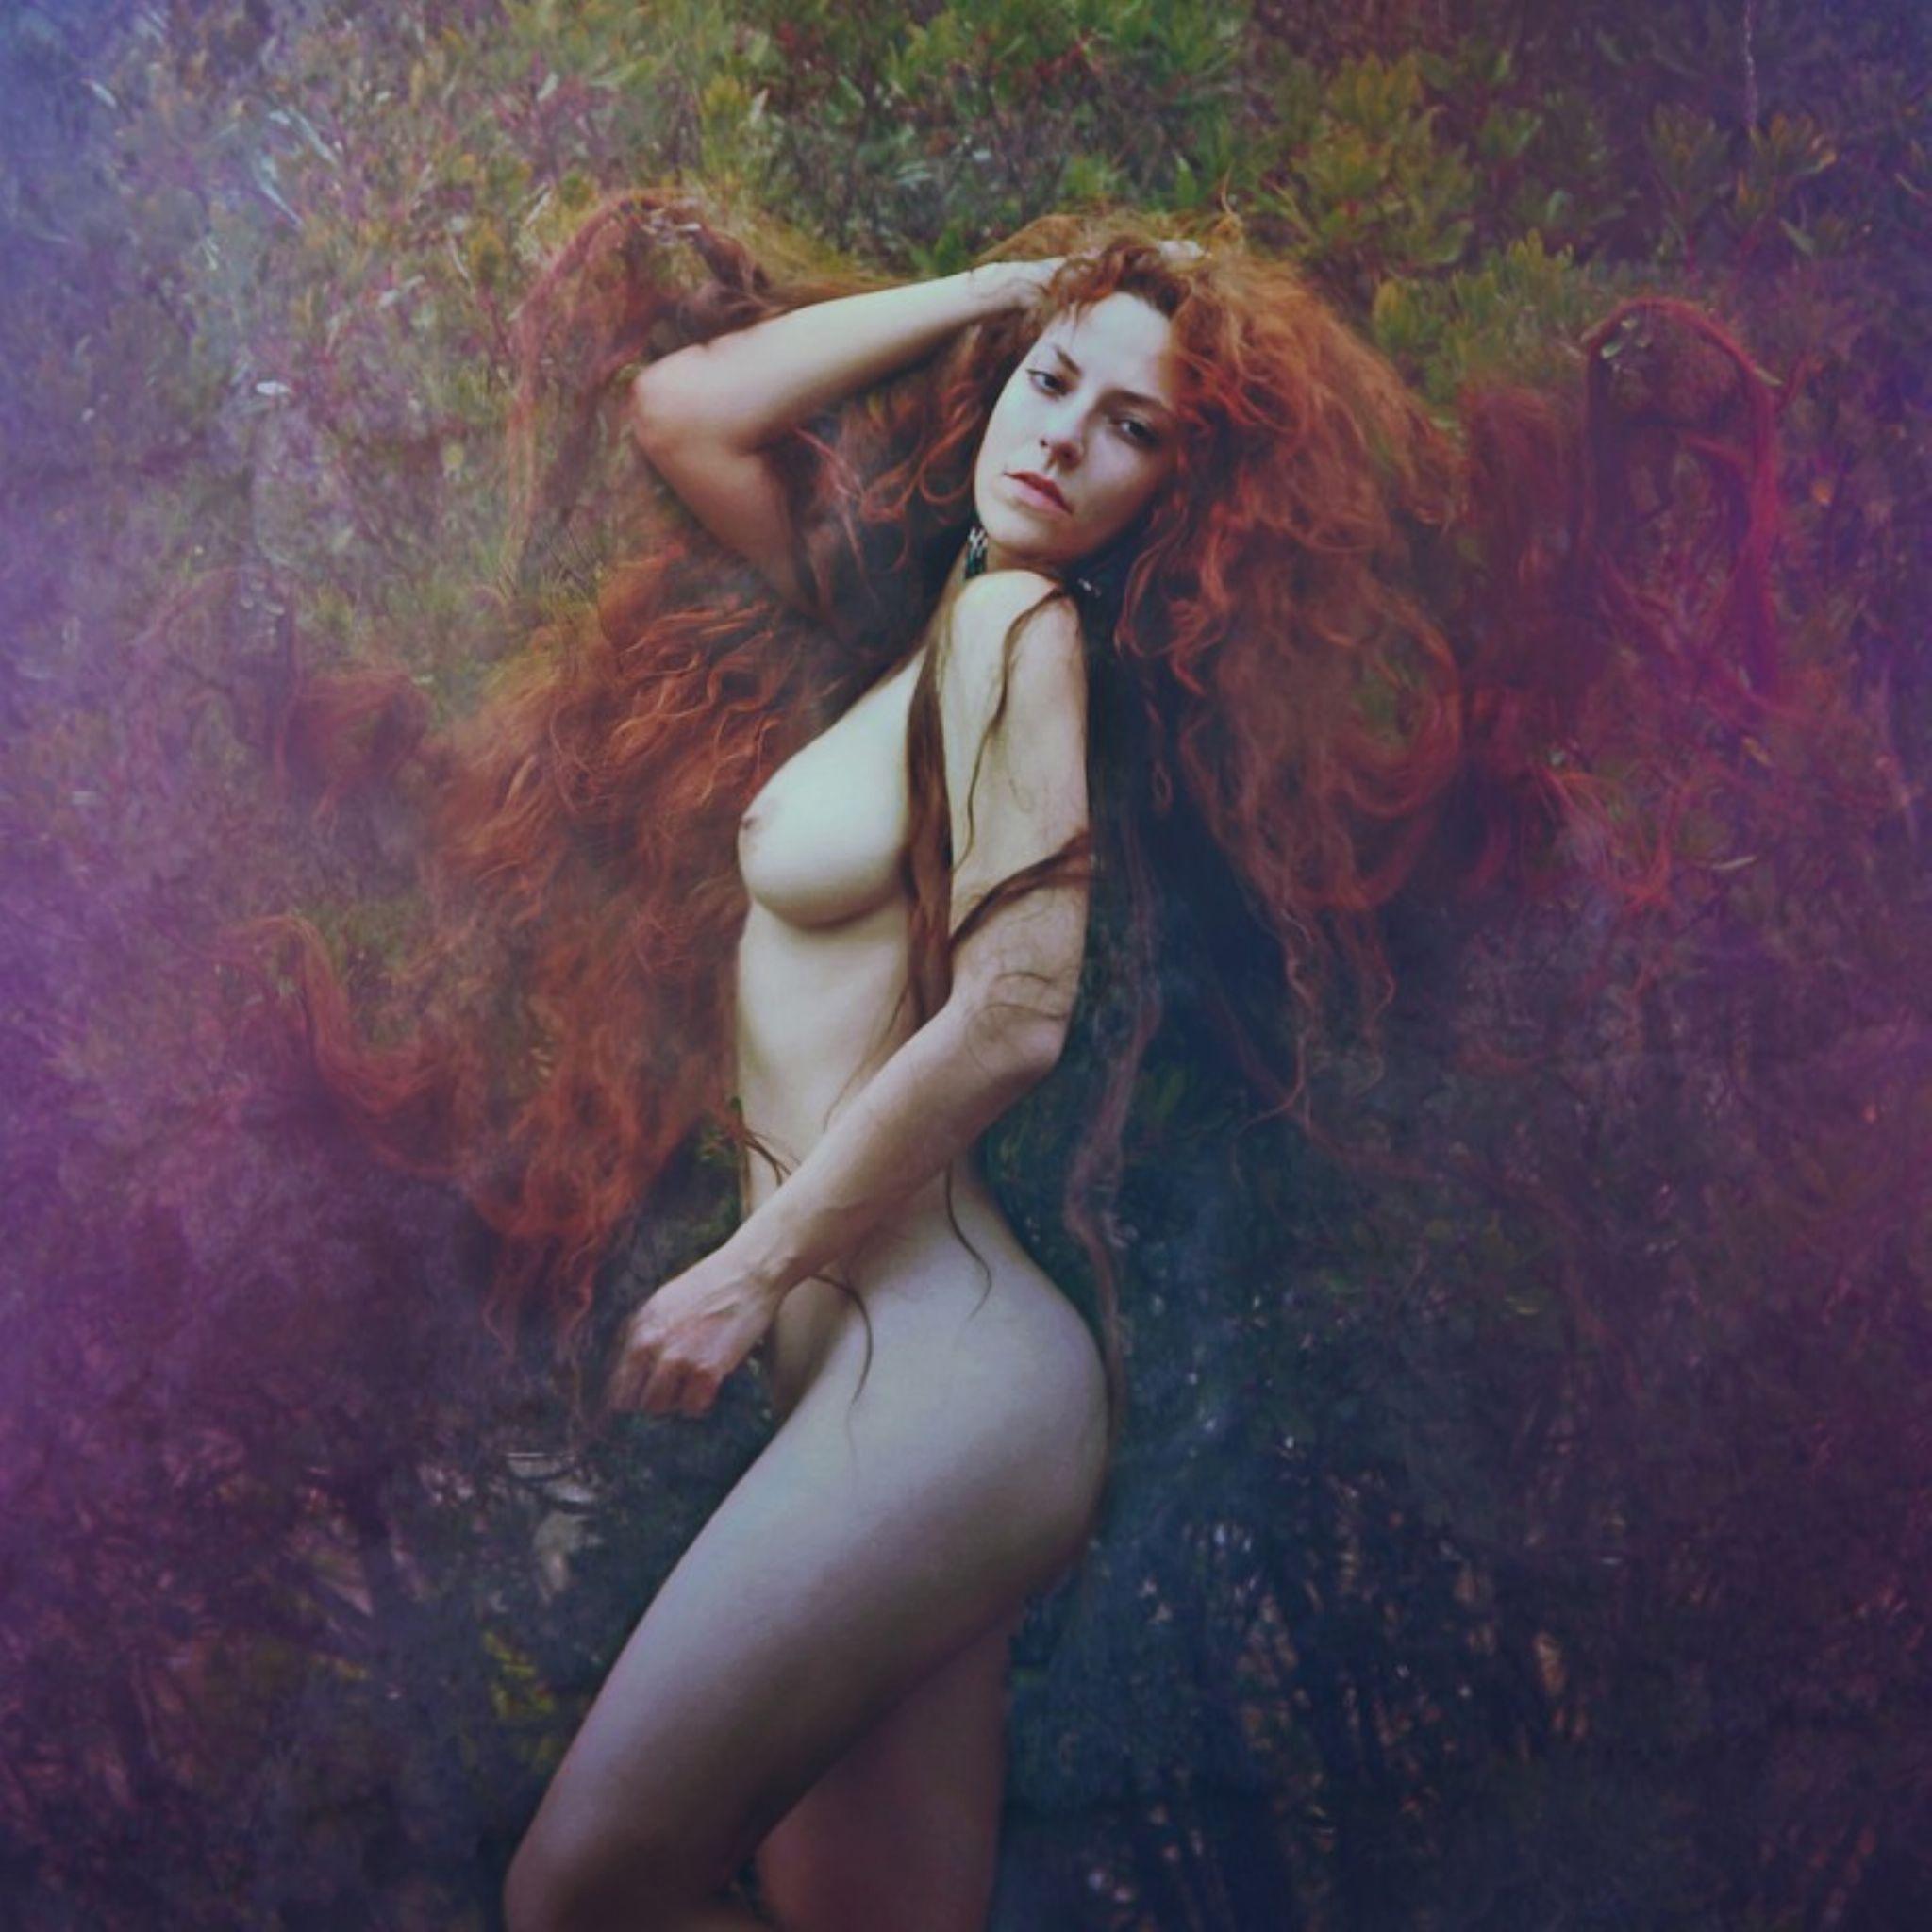 Nymphs by Natalia Kovachevski